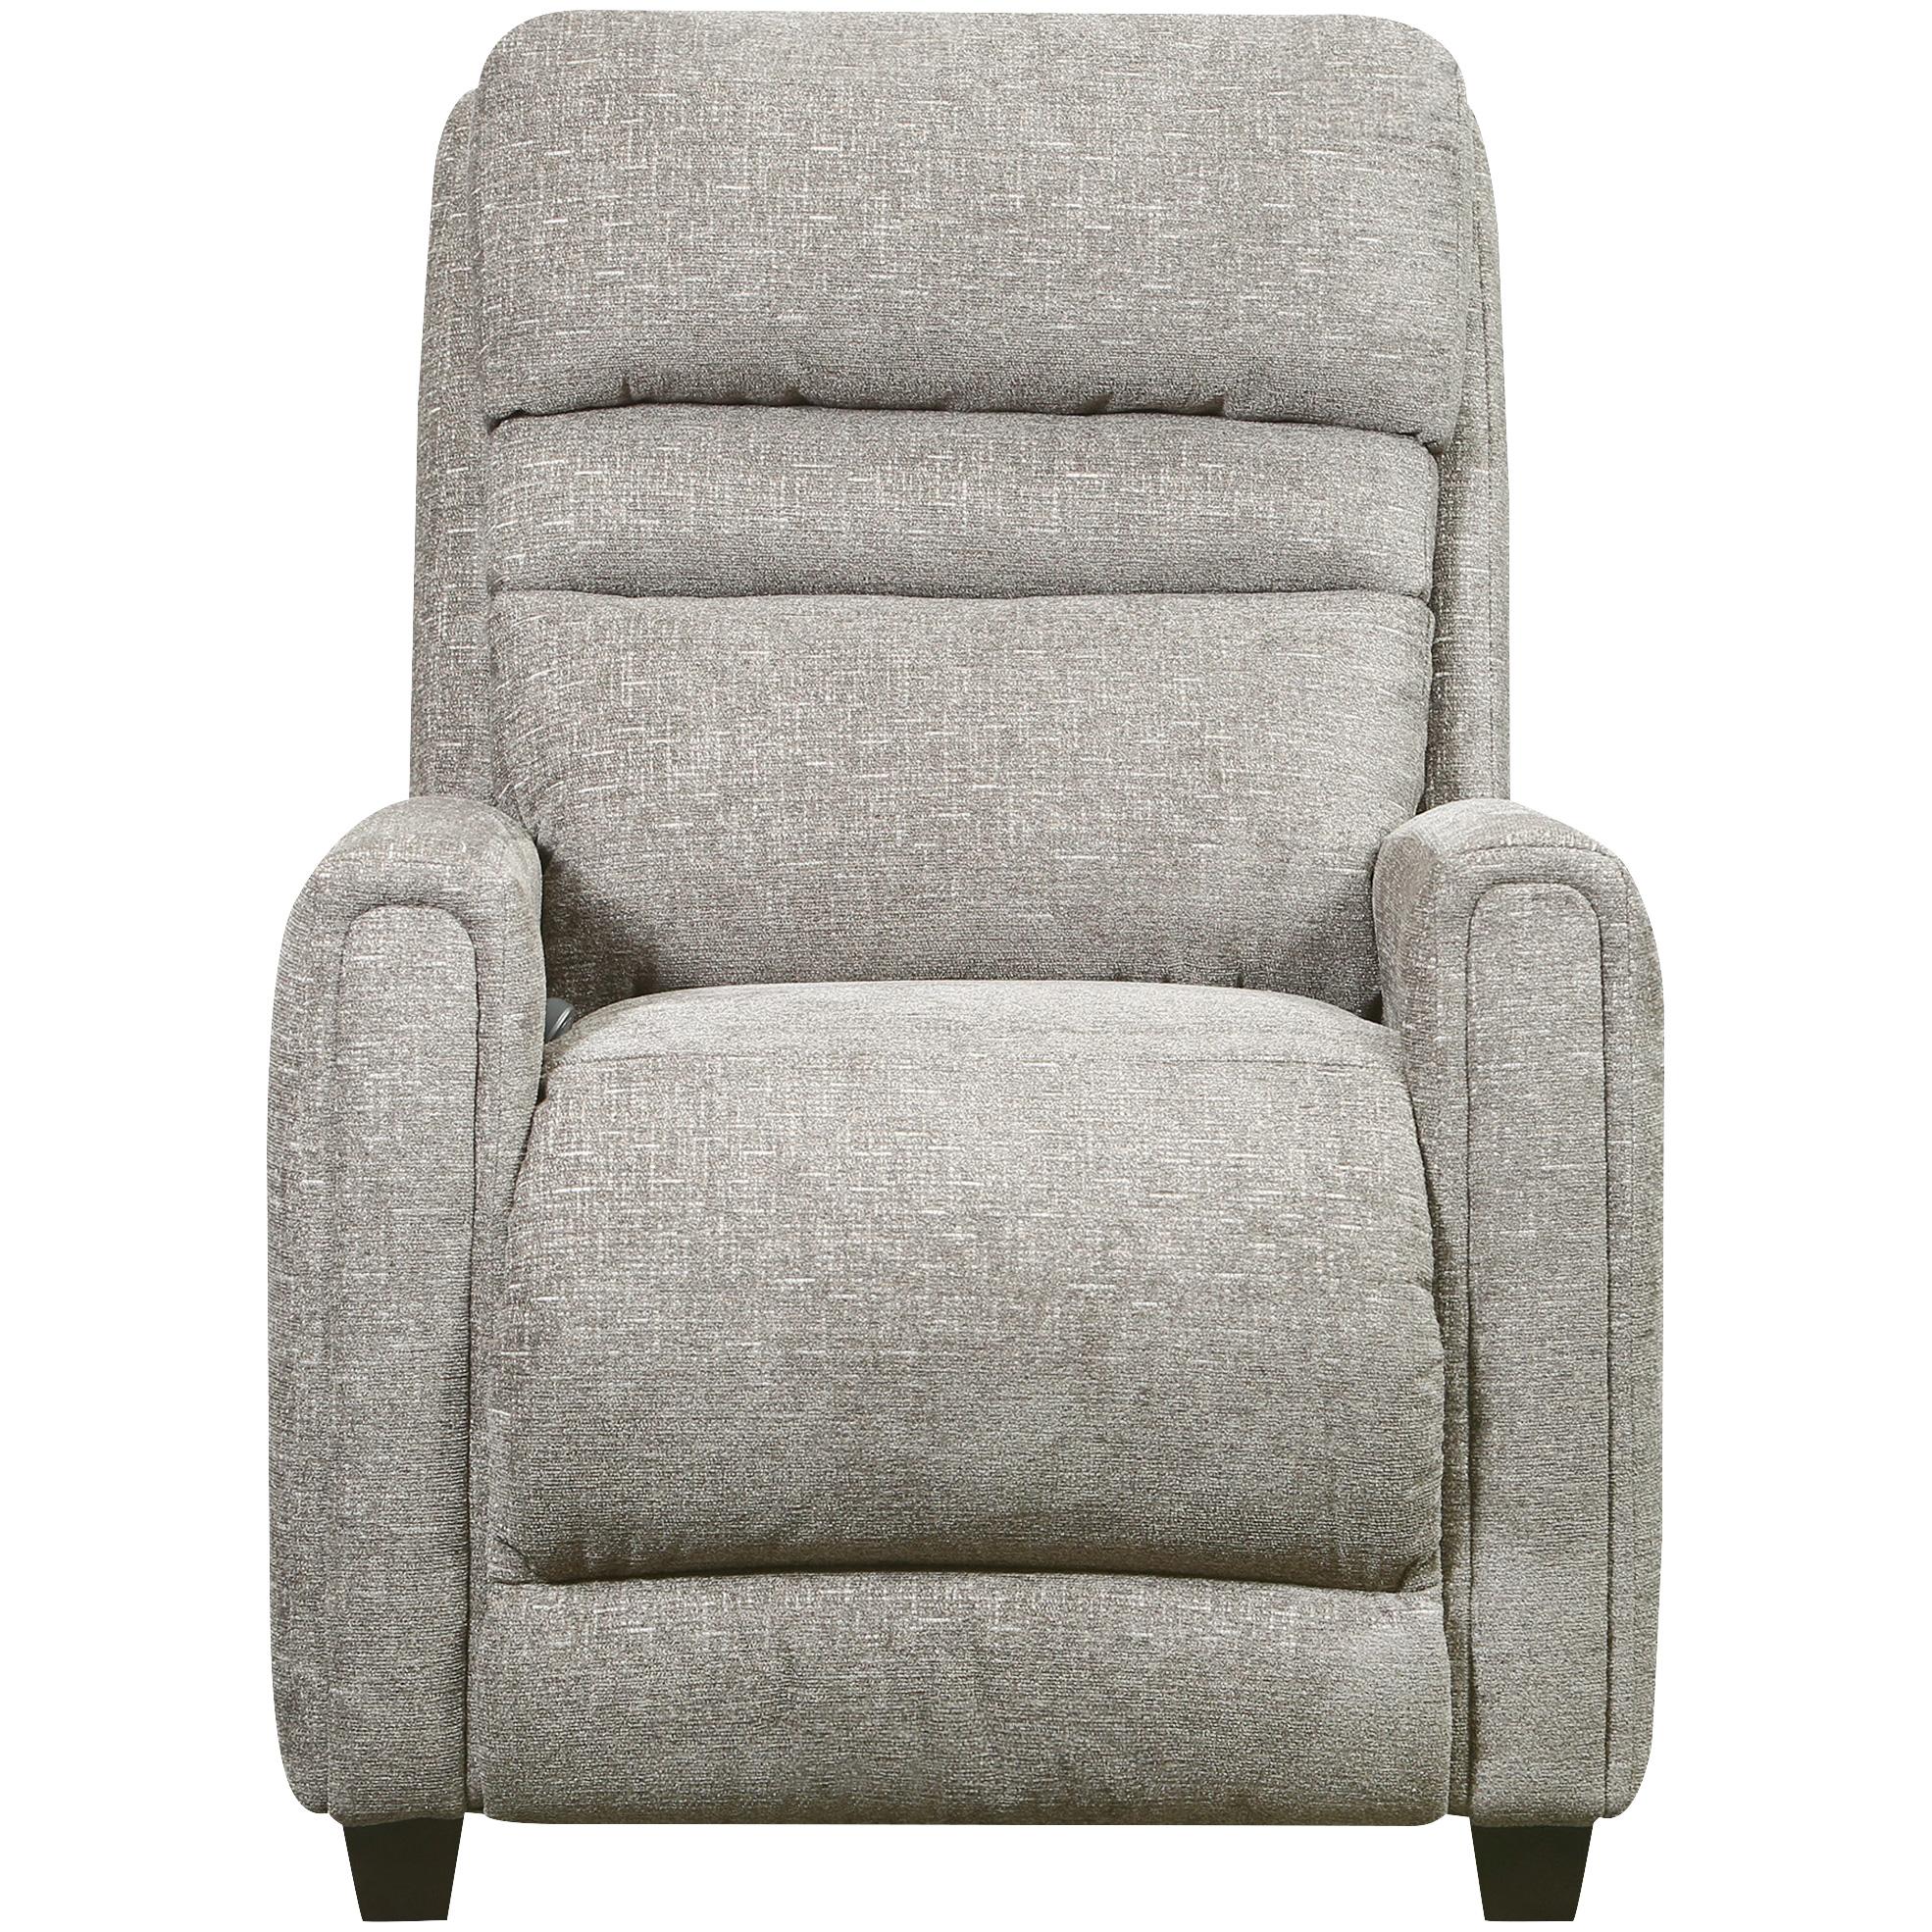 Southern Motion | Turbo Mink Zero Gravity Power+ Leg Recliner Chair